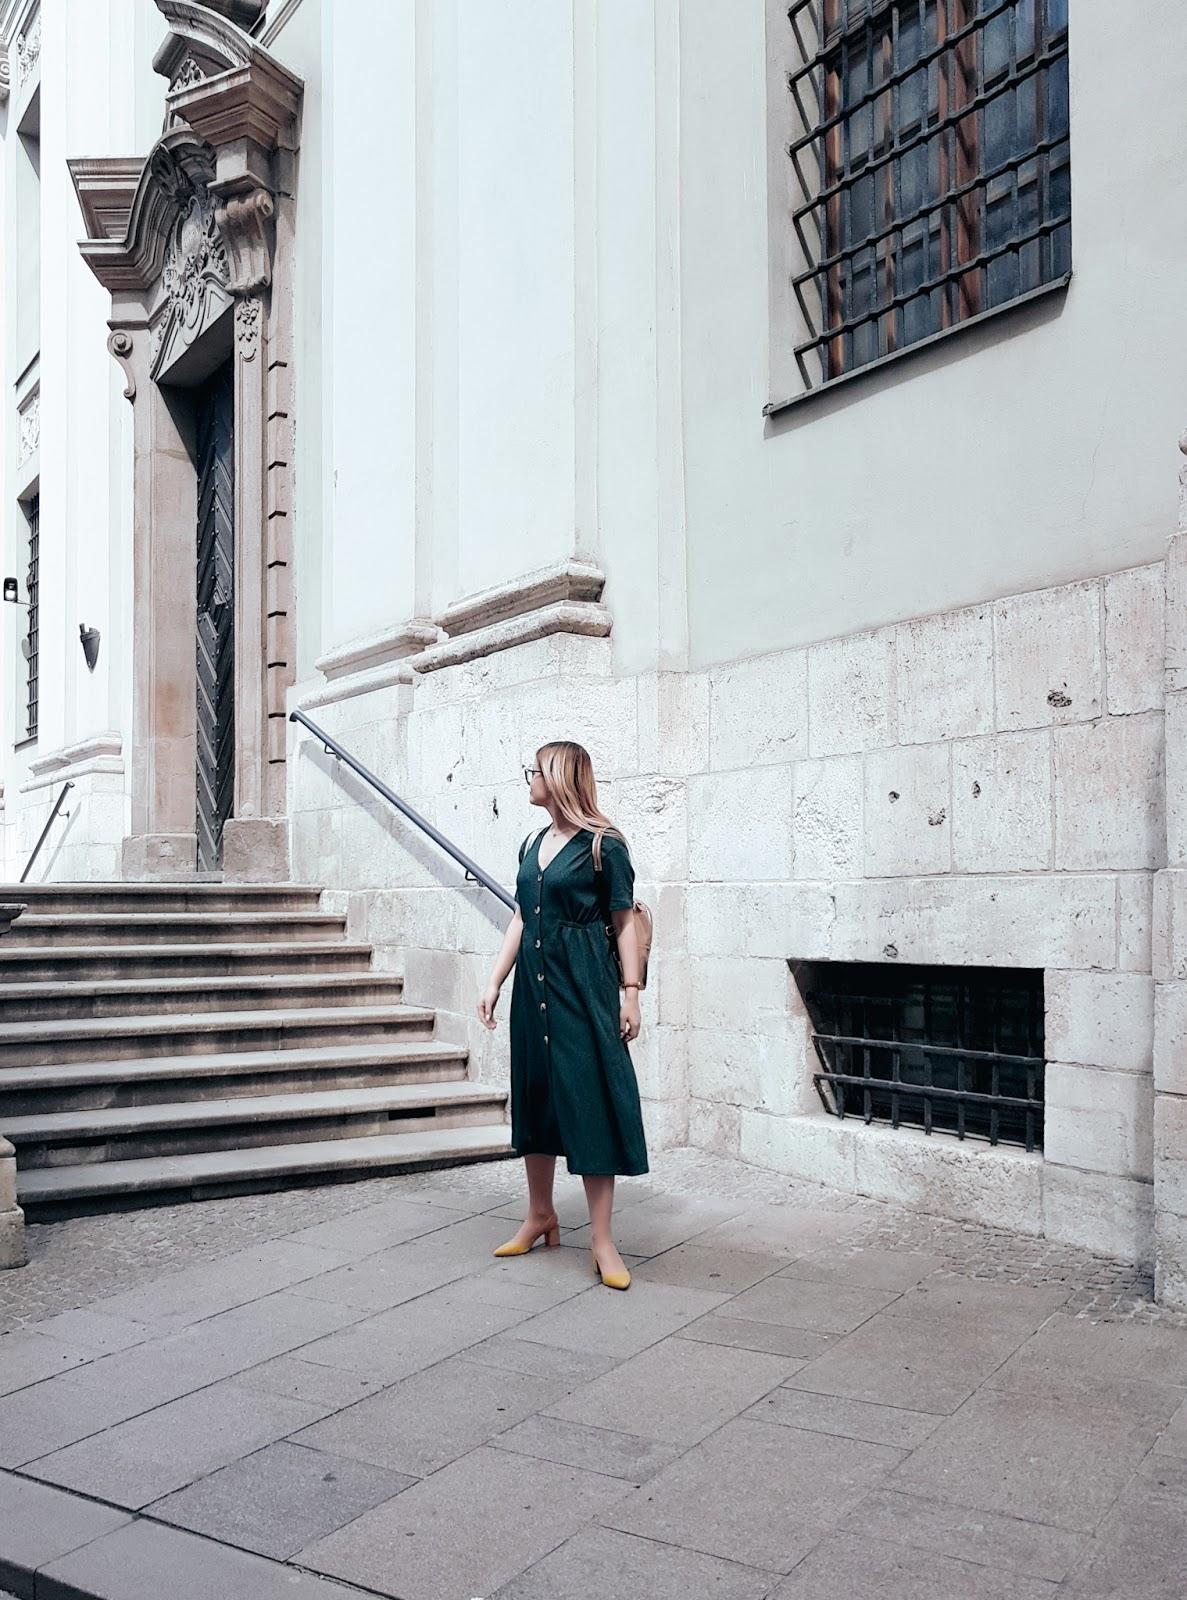 Długa sukienka do pracy. Kraków stare miasto